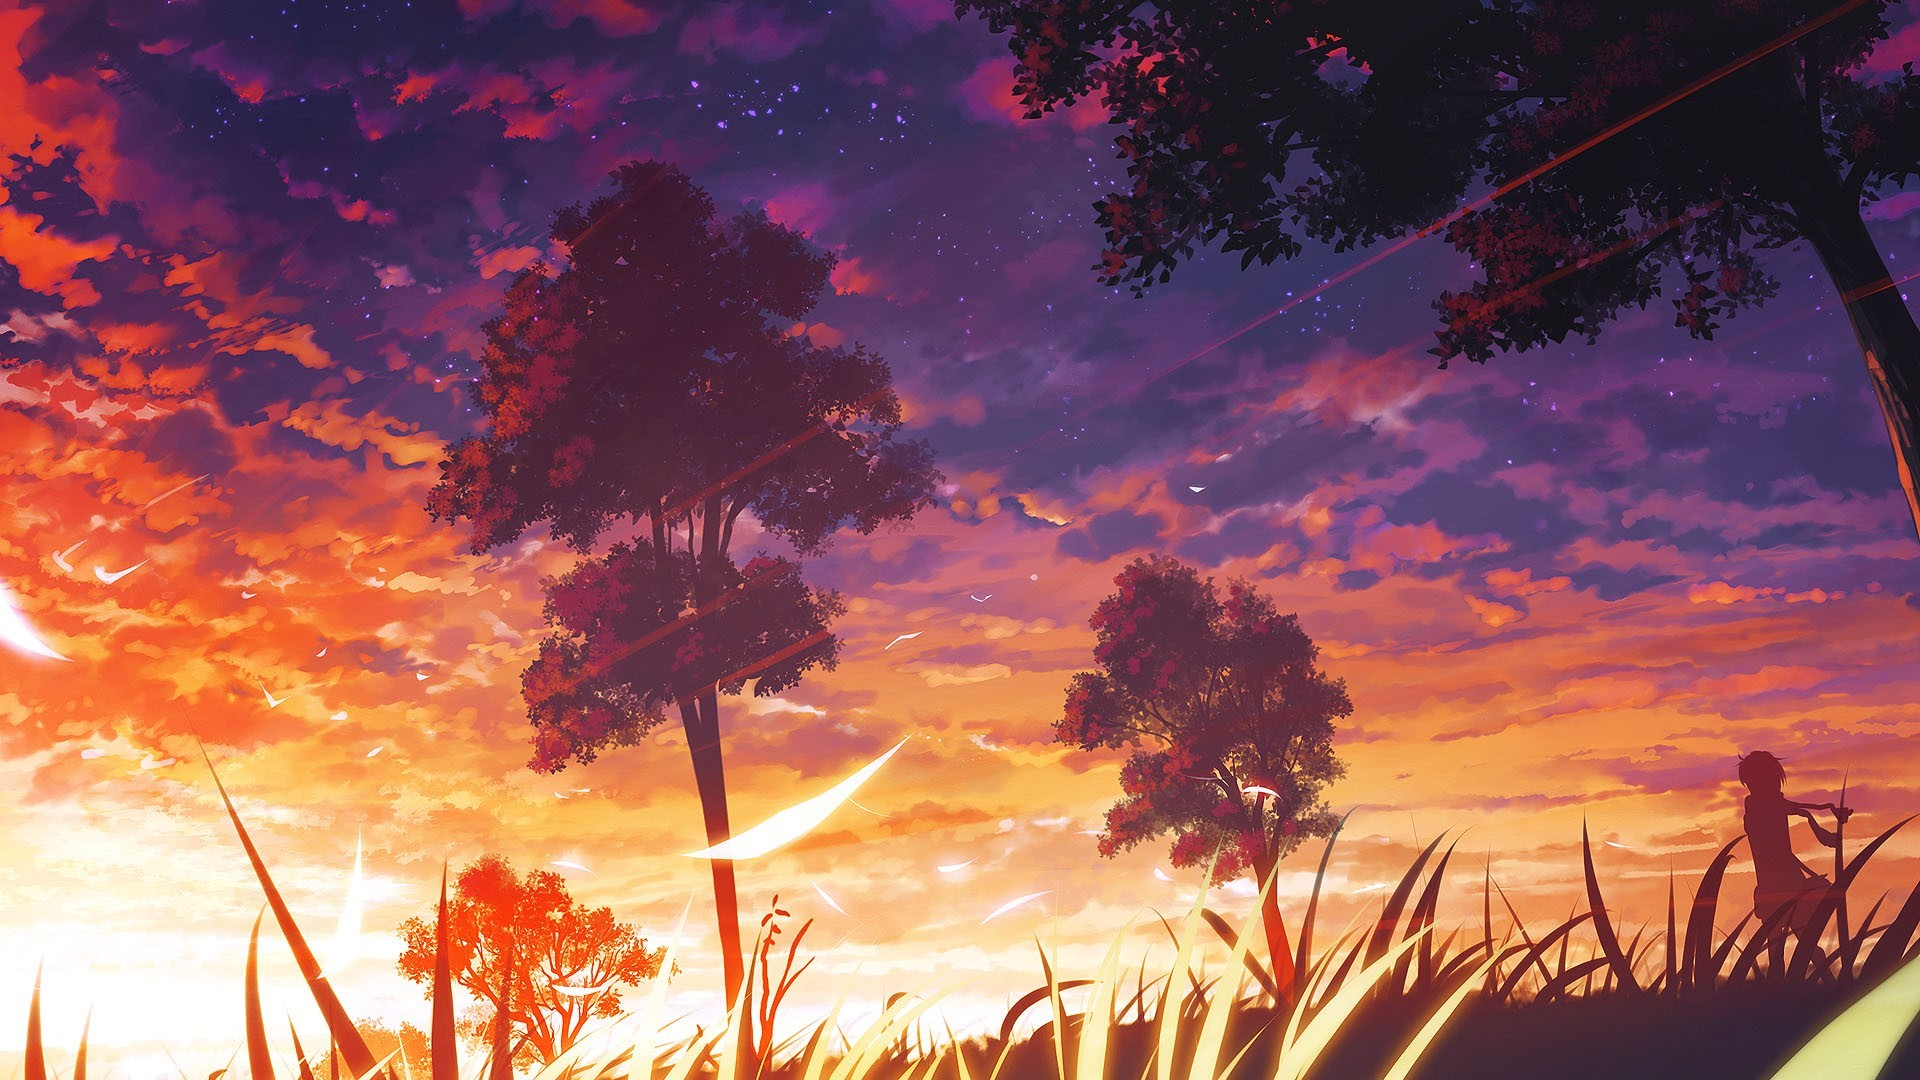 Unduh 78+ Wallpaper Anime Hd Quality Terbaik